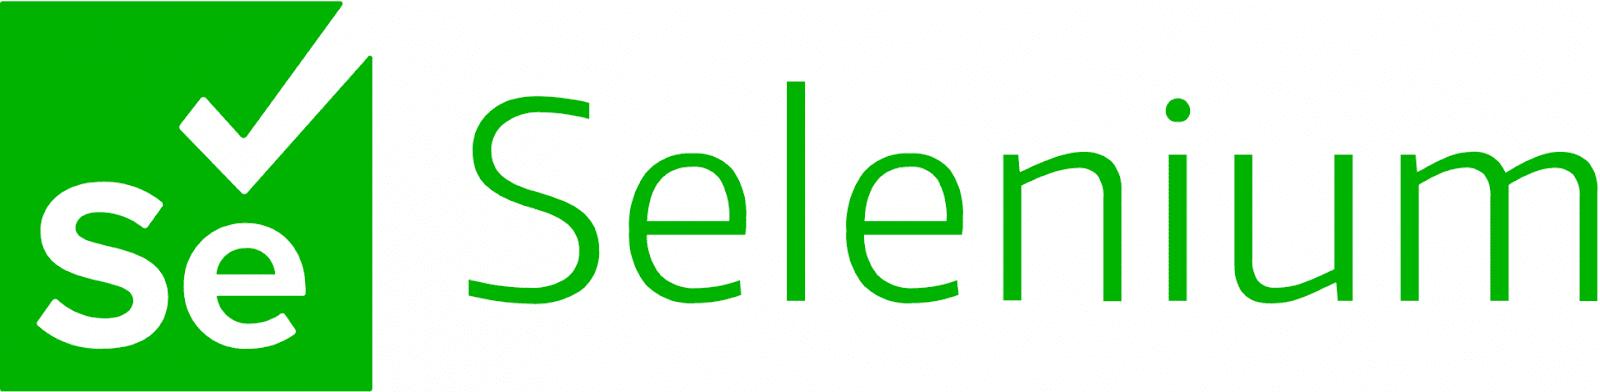 selenium_logo Python Technology Stack